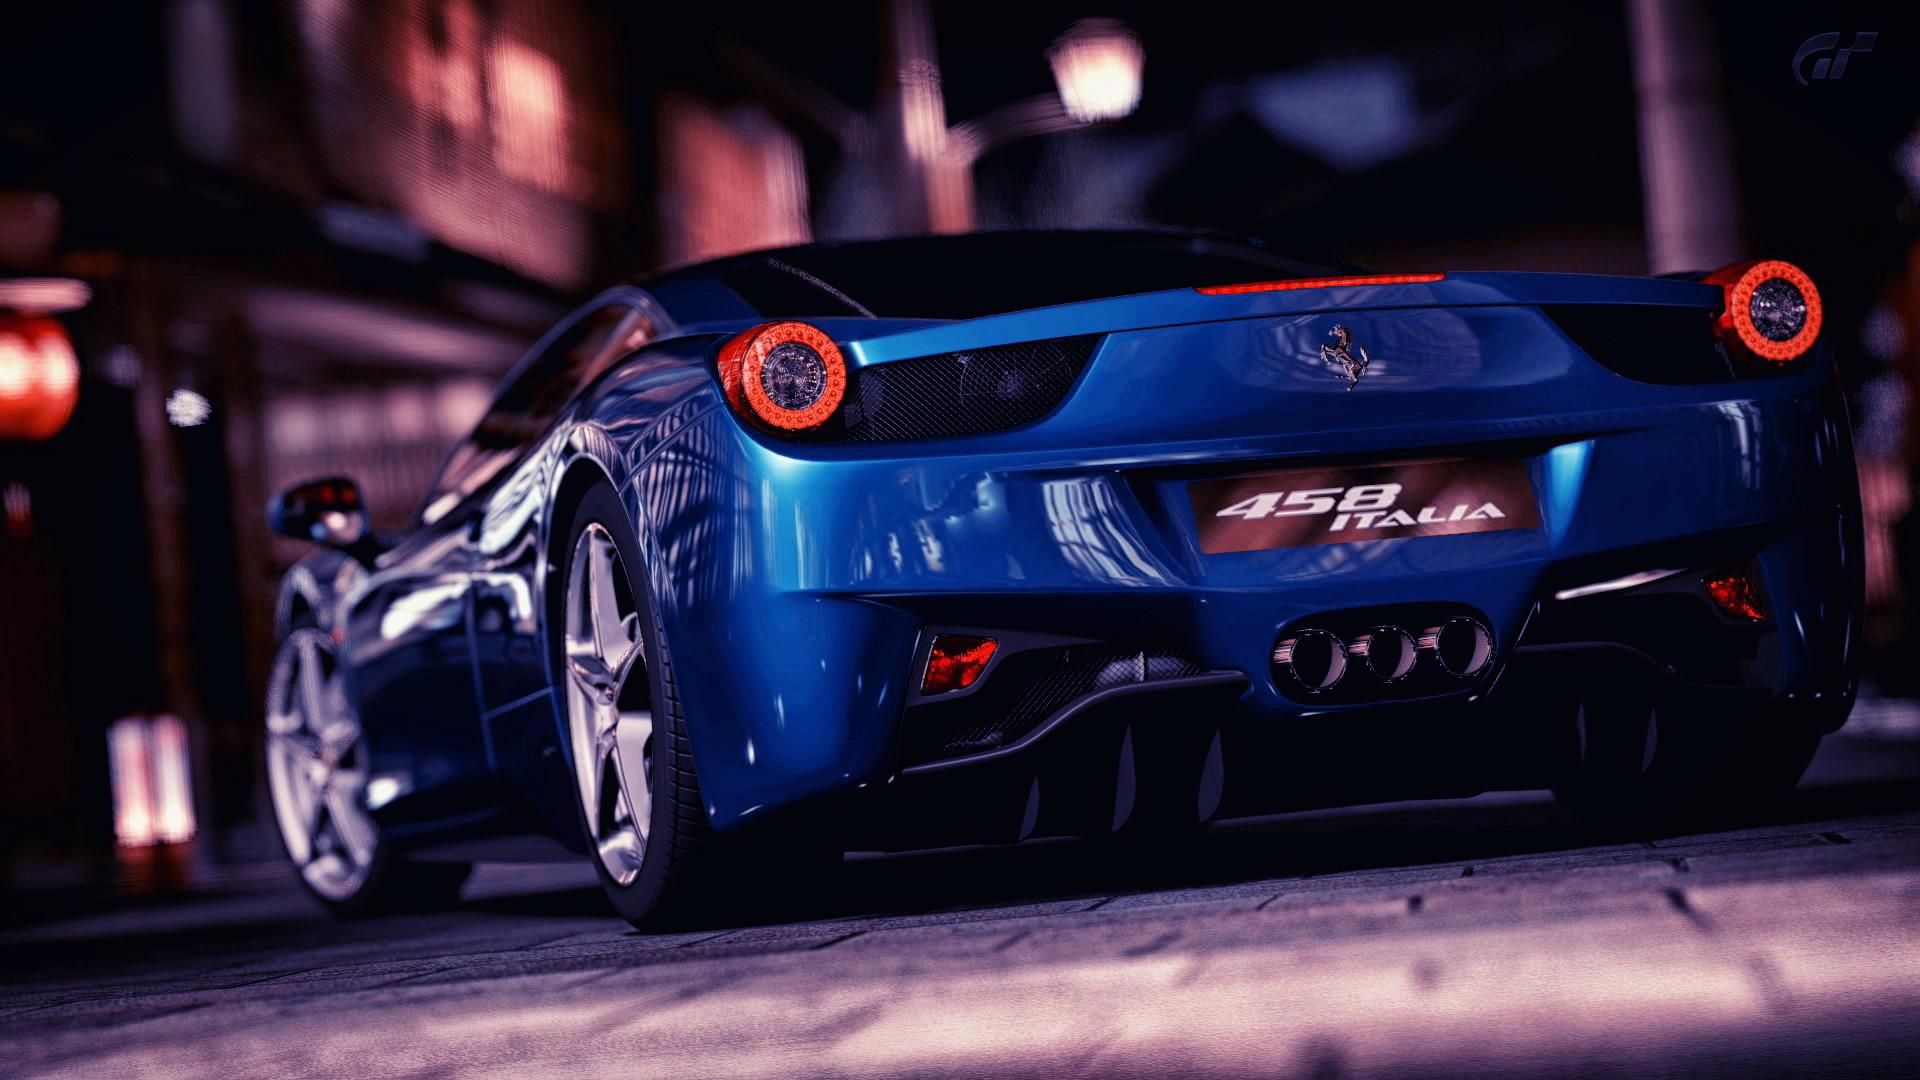 Ferrari Car Awesome High Quality HD Wallpapers …